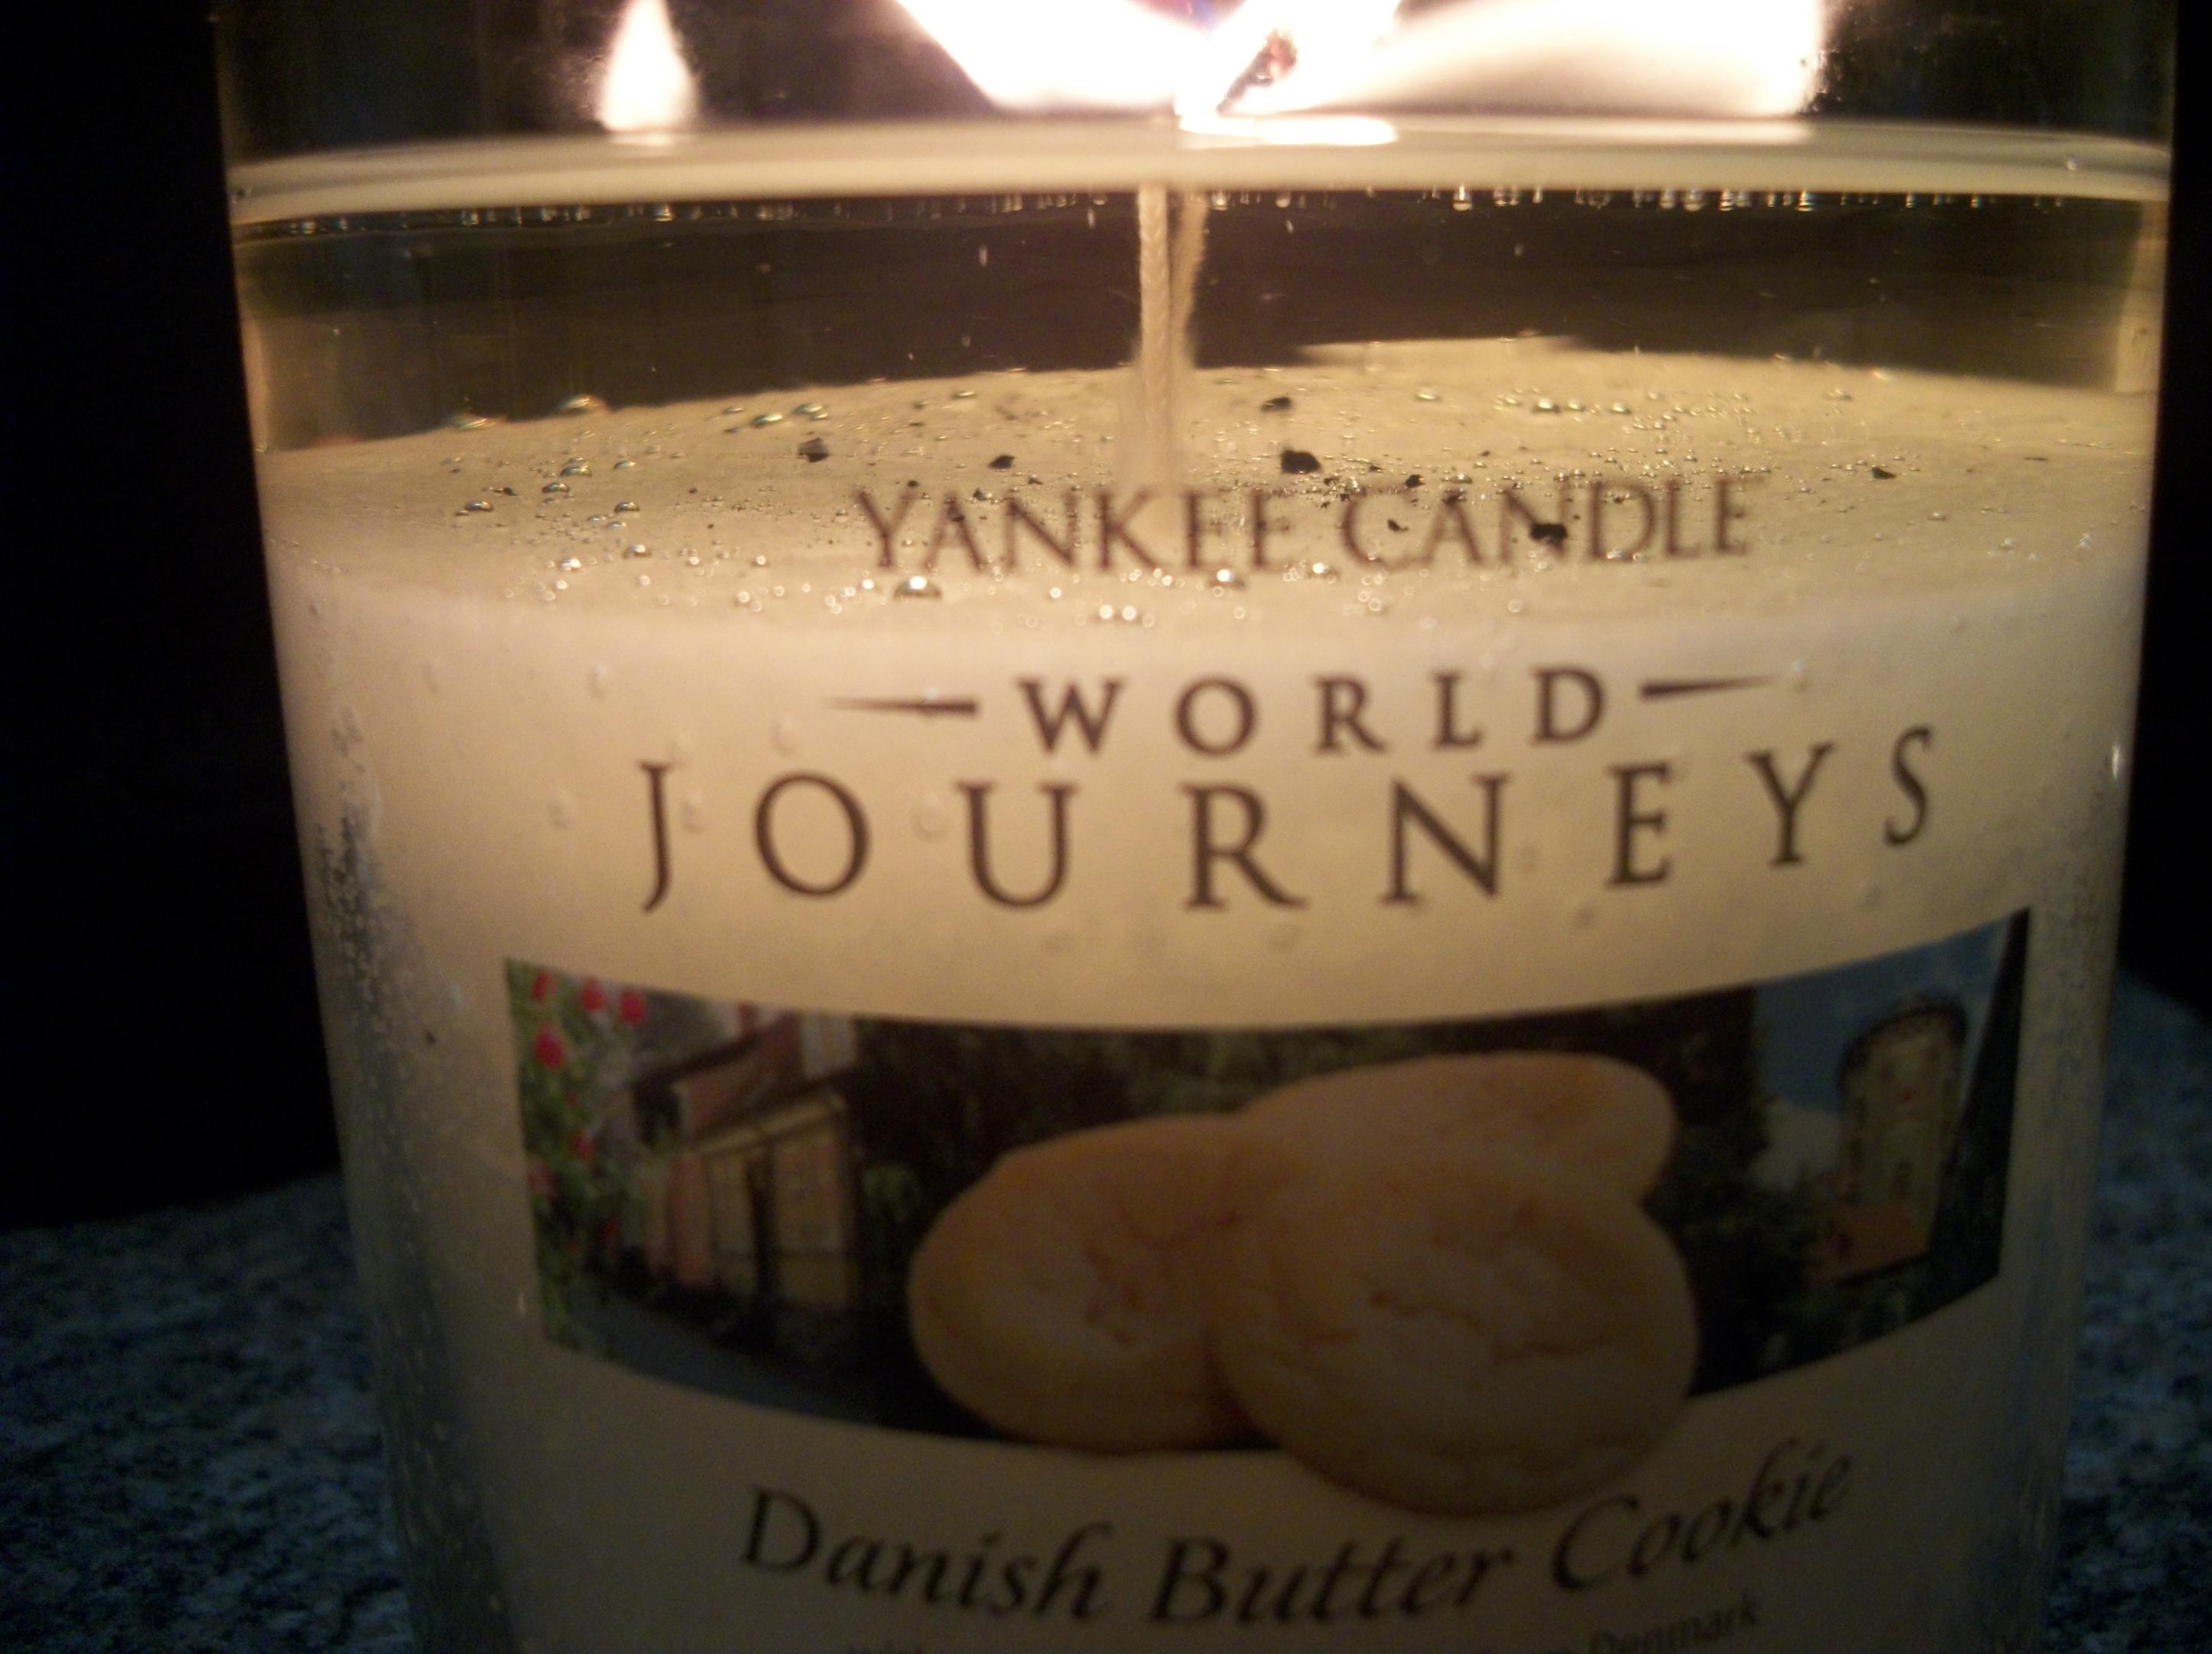 Better Homes and Gardens Tarts – YankeeCandleSisters